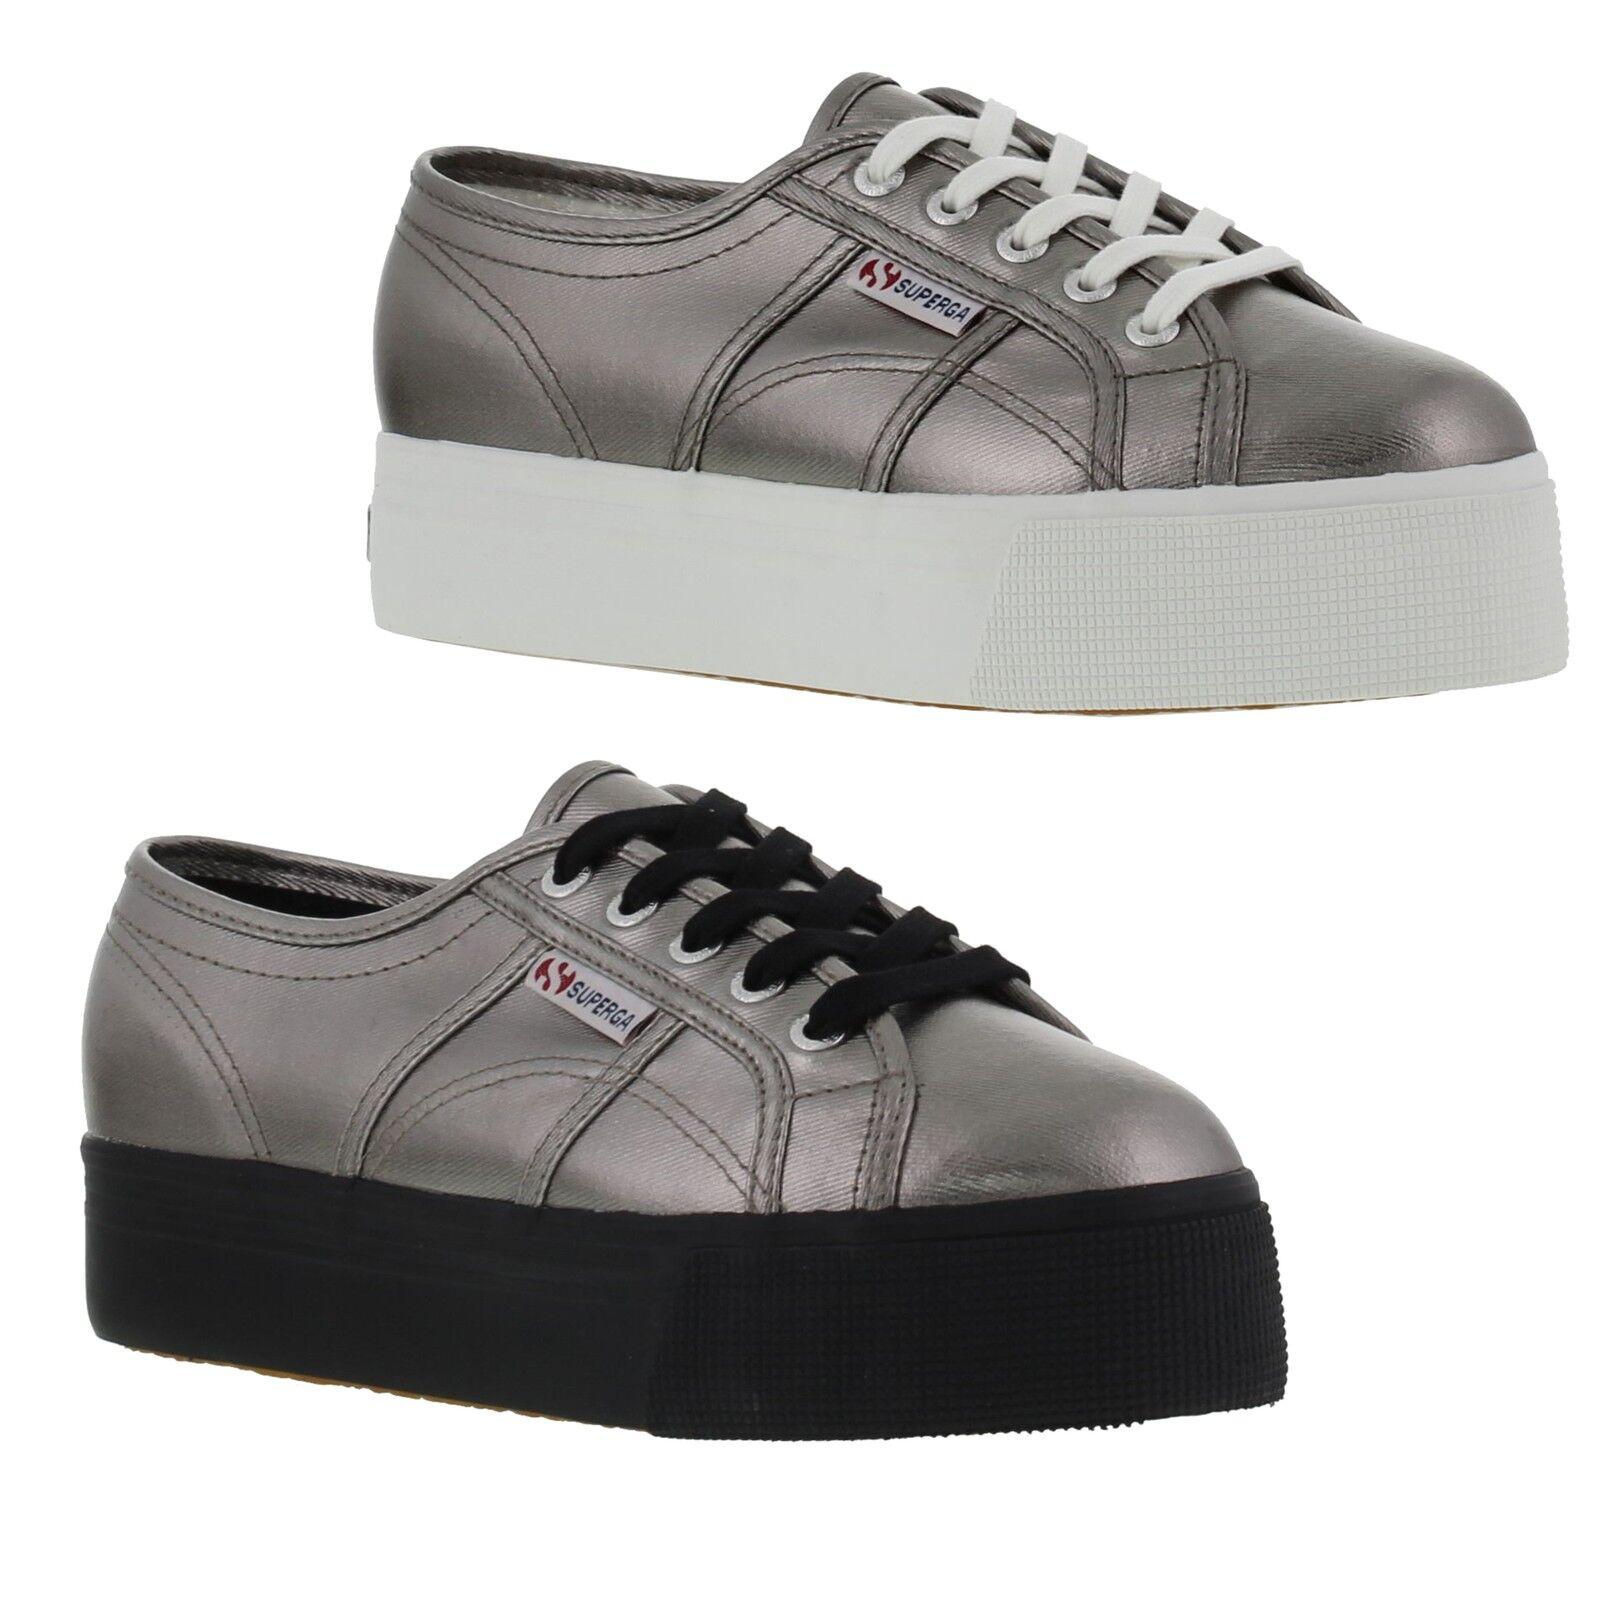 Superga 2790 Cotmetu Femme Sliver Chunky Platform Trainers Chaussures